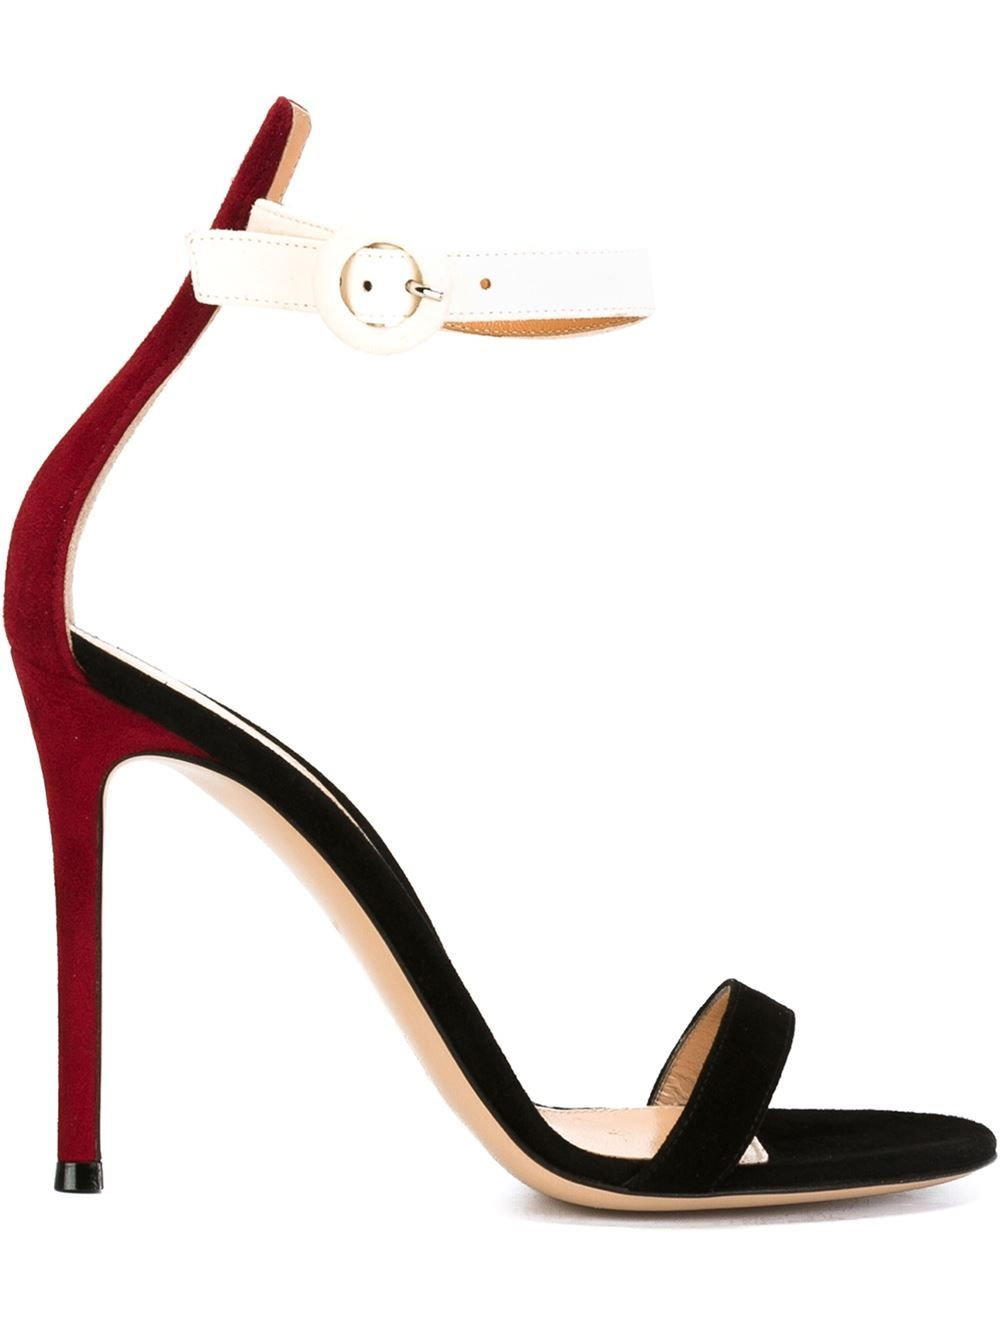 Gianvito Rossi Portofino Sandals Womens Sandals Women Shoes Womens Beach Fashion